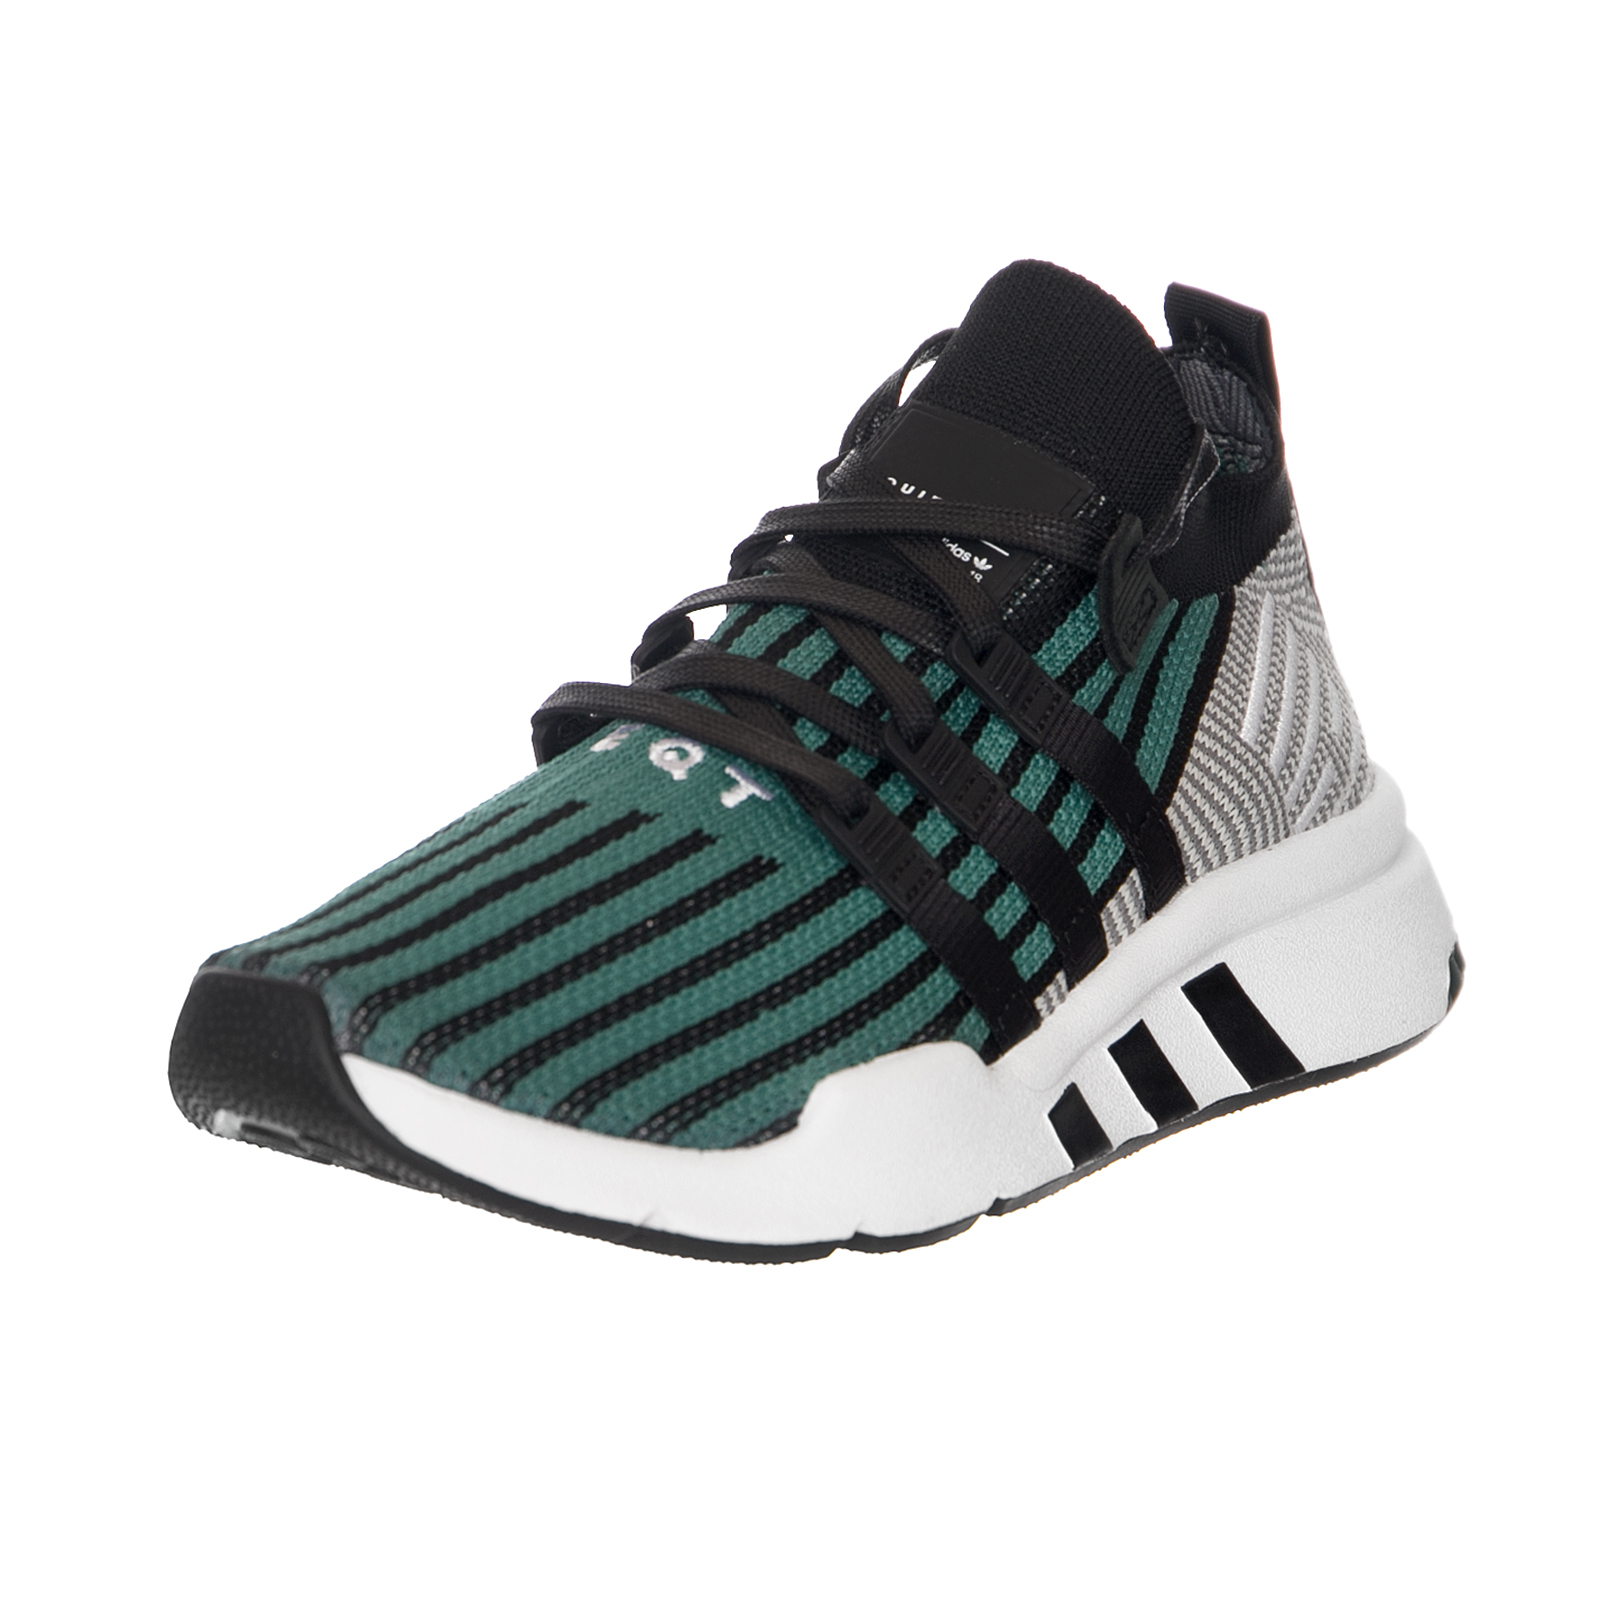 Adidas Baskets Eqt Support Mid Adv Noir / Noir / Vert Nero